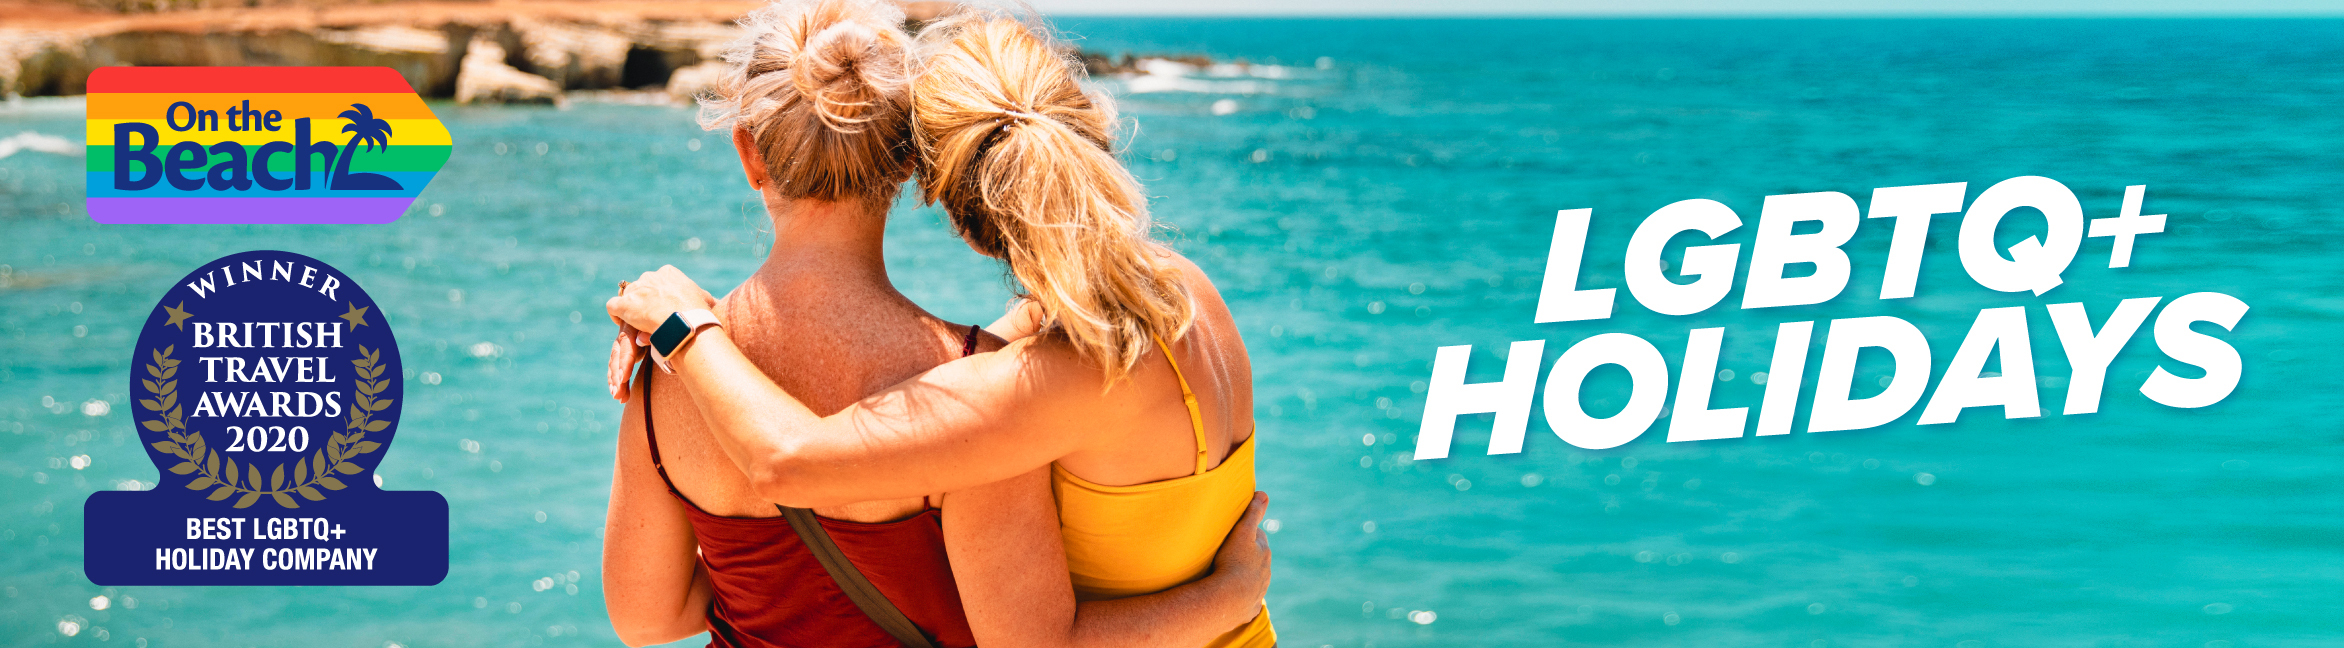 LGBT Holidays with On the Beach